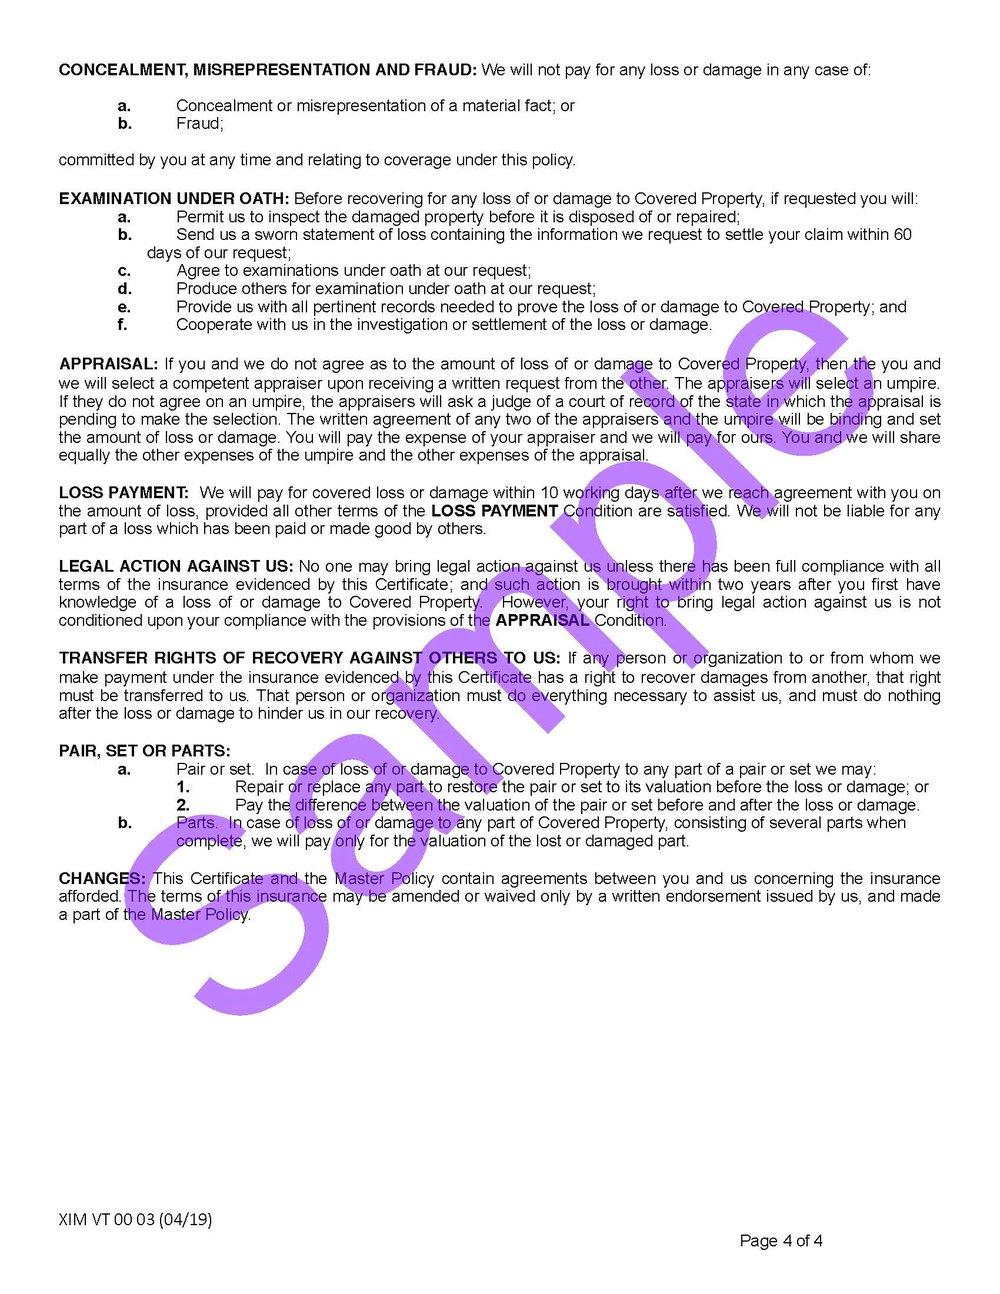 XIM VT 00 03 04 19 Vermont Certificate of InsuranceSample_Page_4.jpg